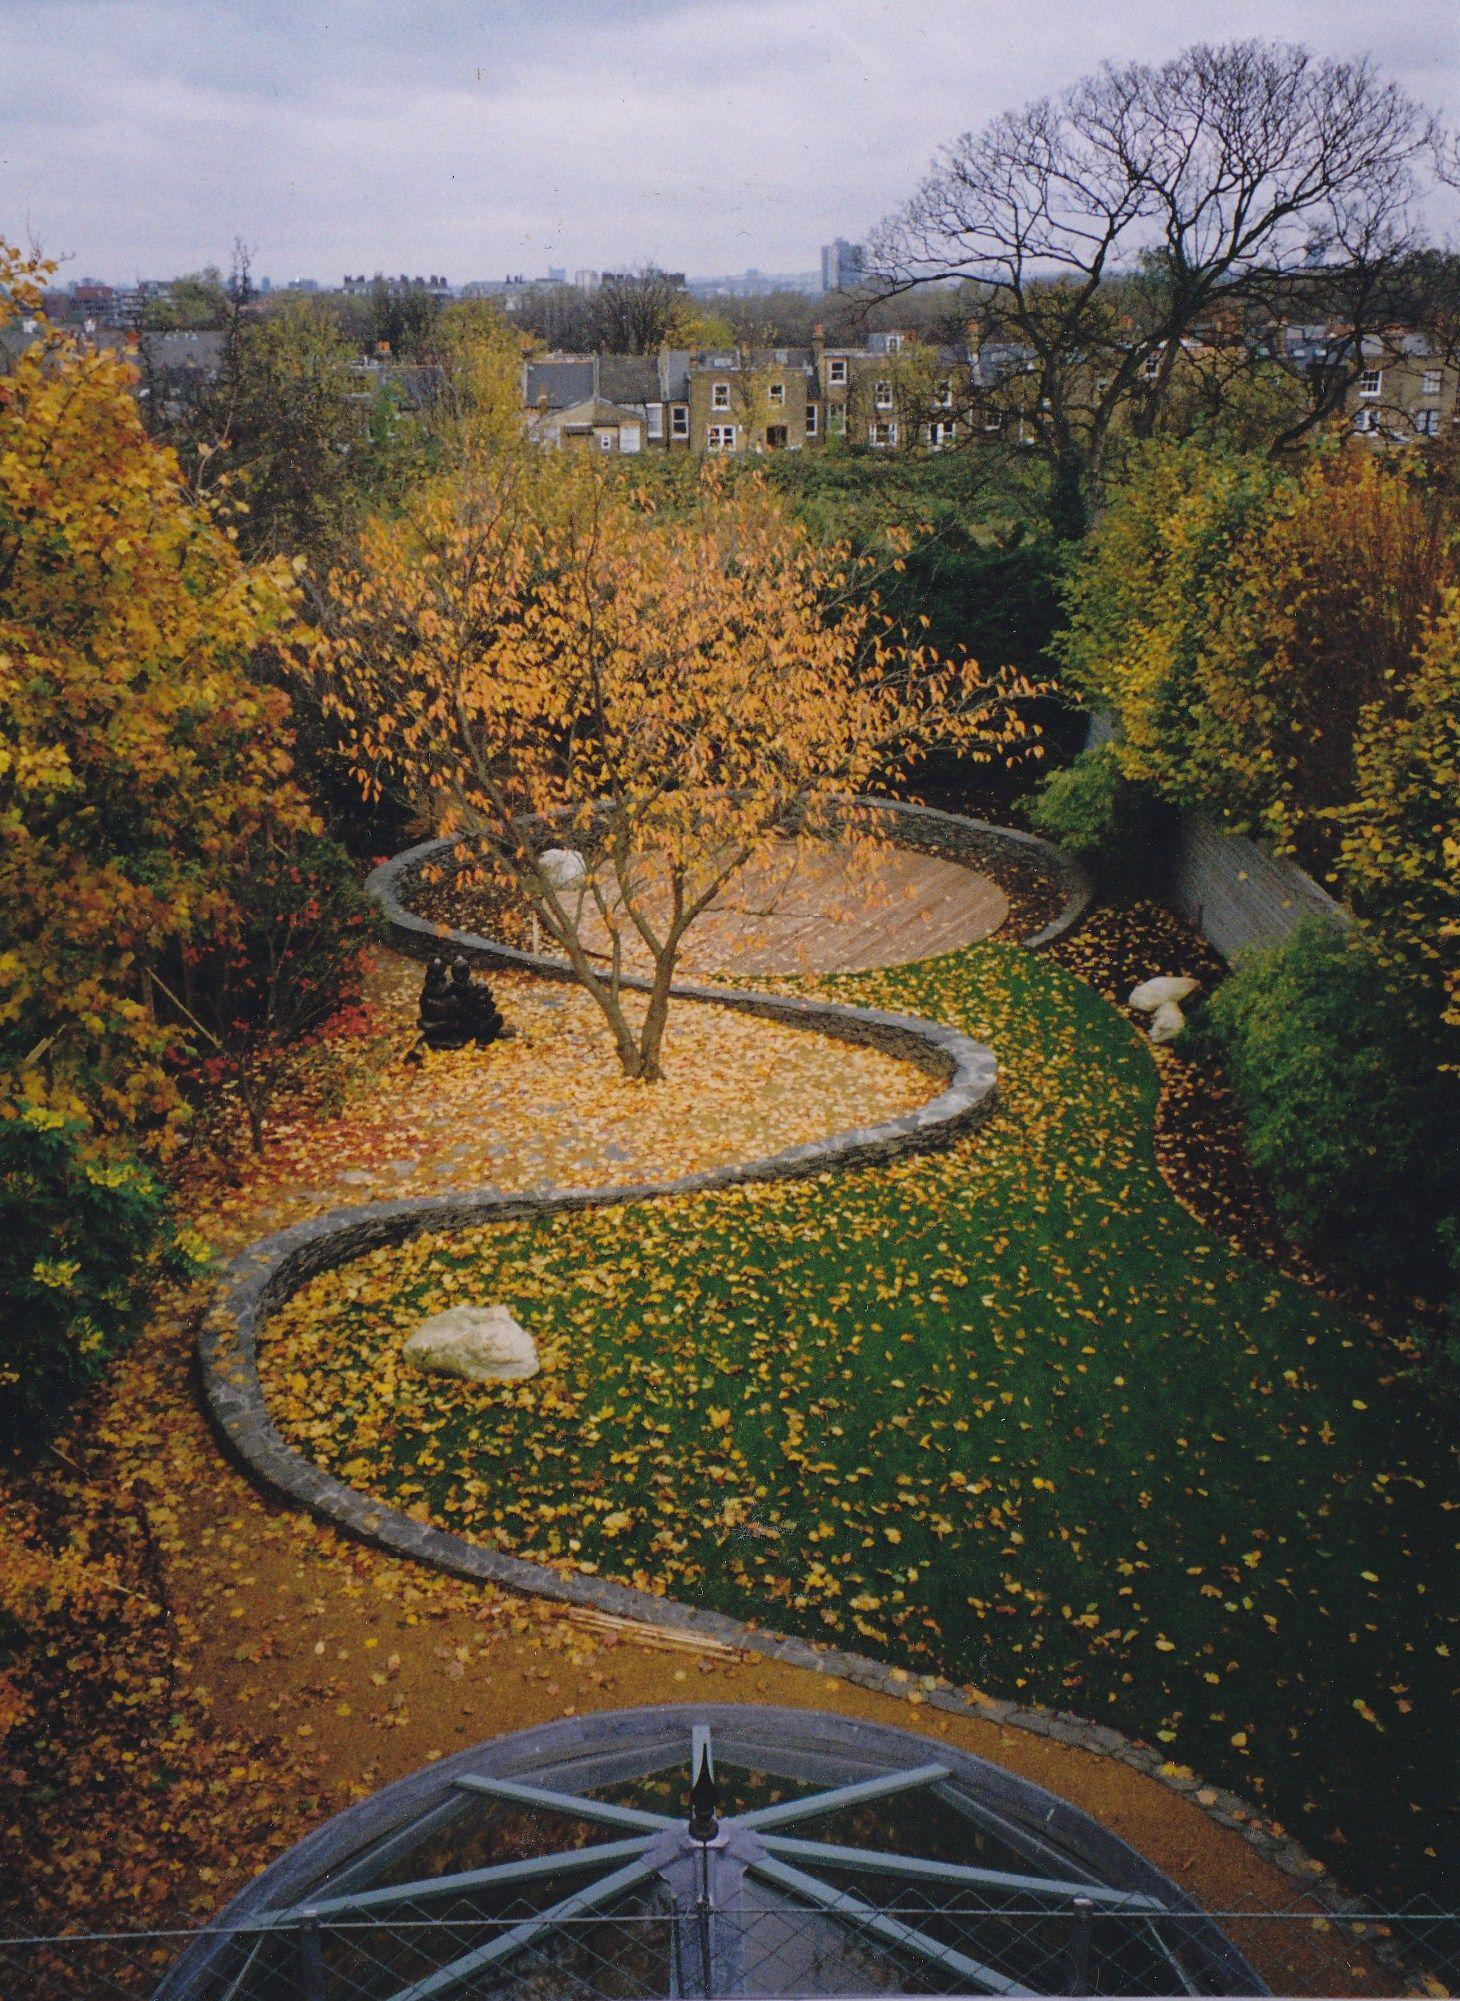 Autumn at Foster's garden by Roberto Silva Landscape and Garden Deisgn